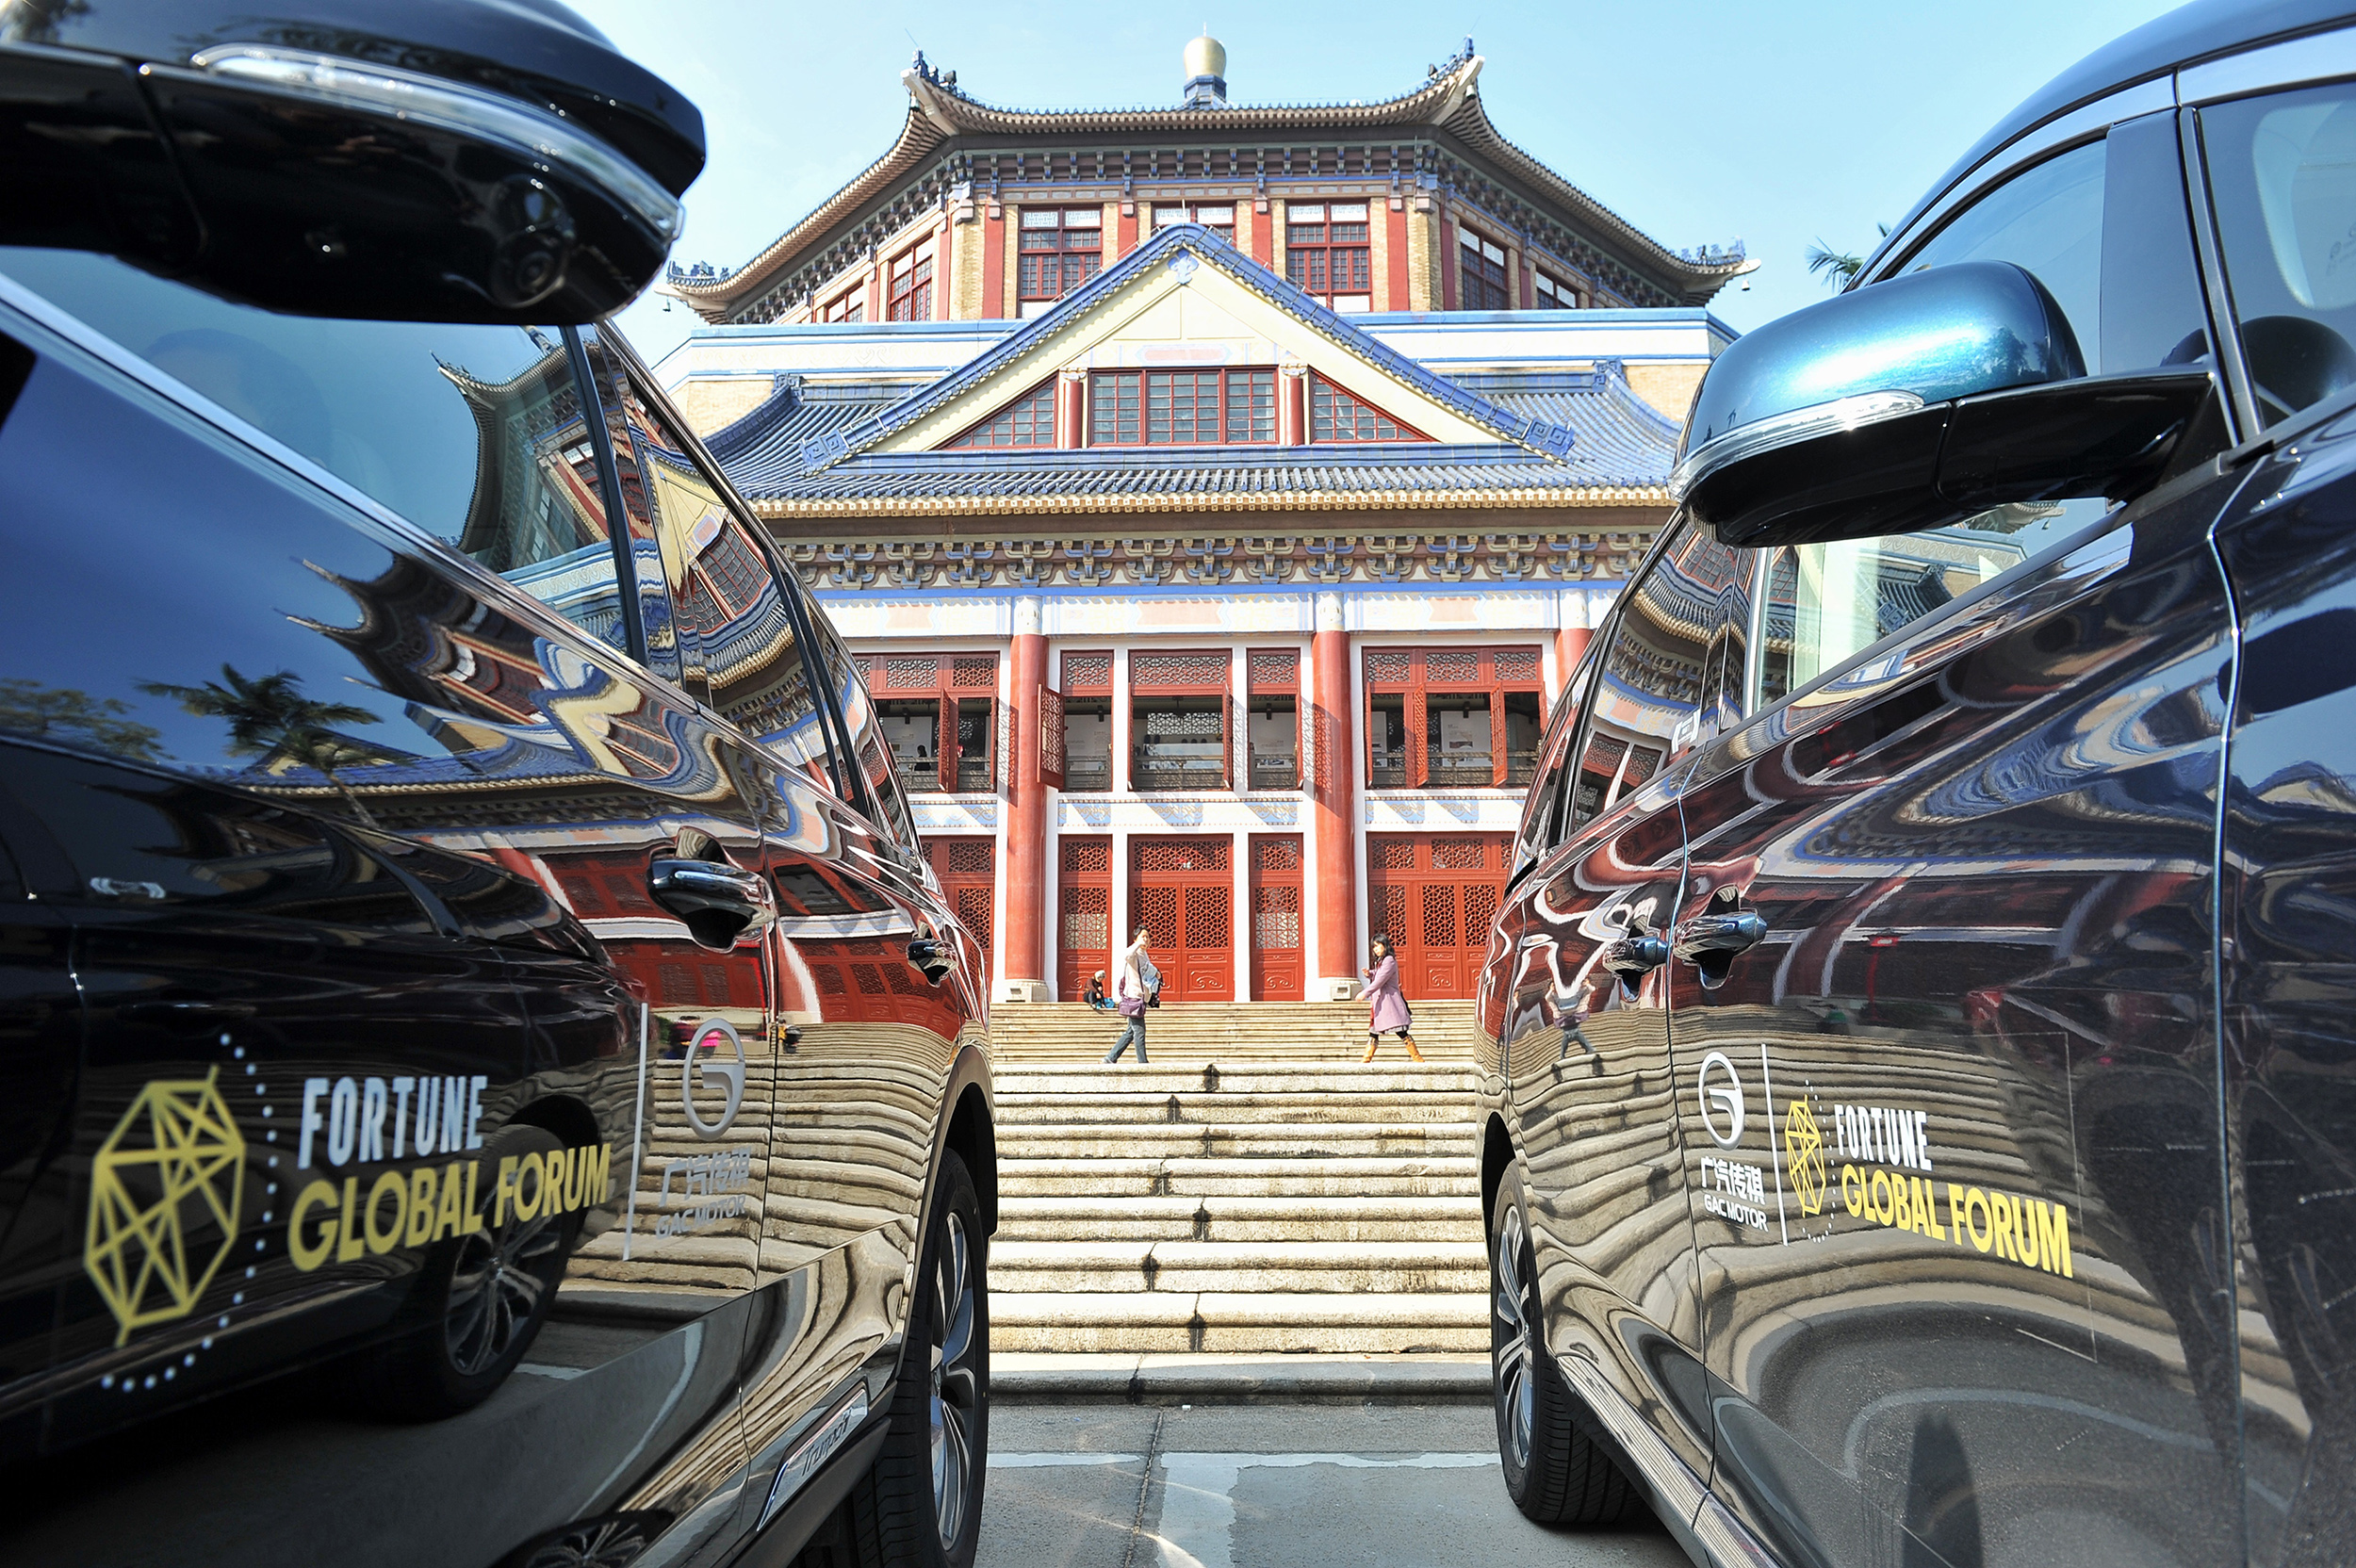 GAC Motor Named Official Service Car Provider for Fortune Global Forum 2017